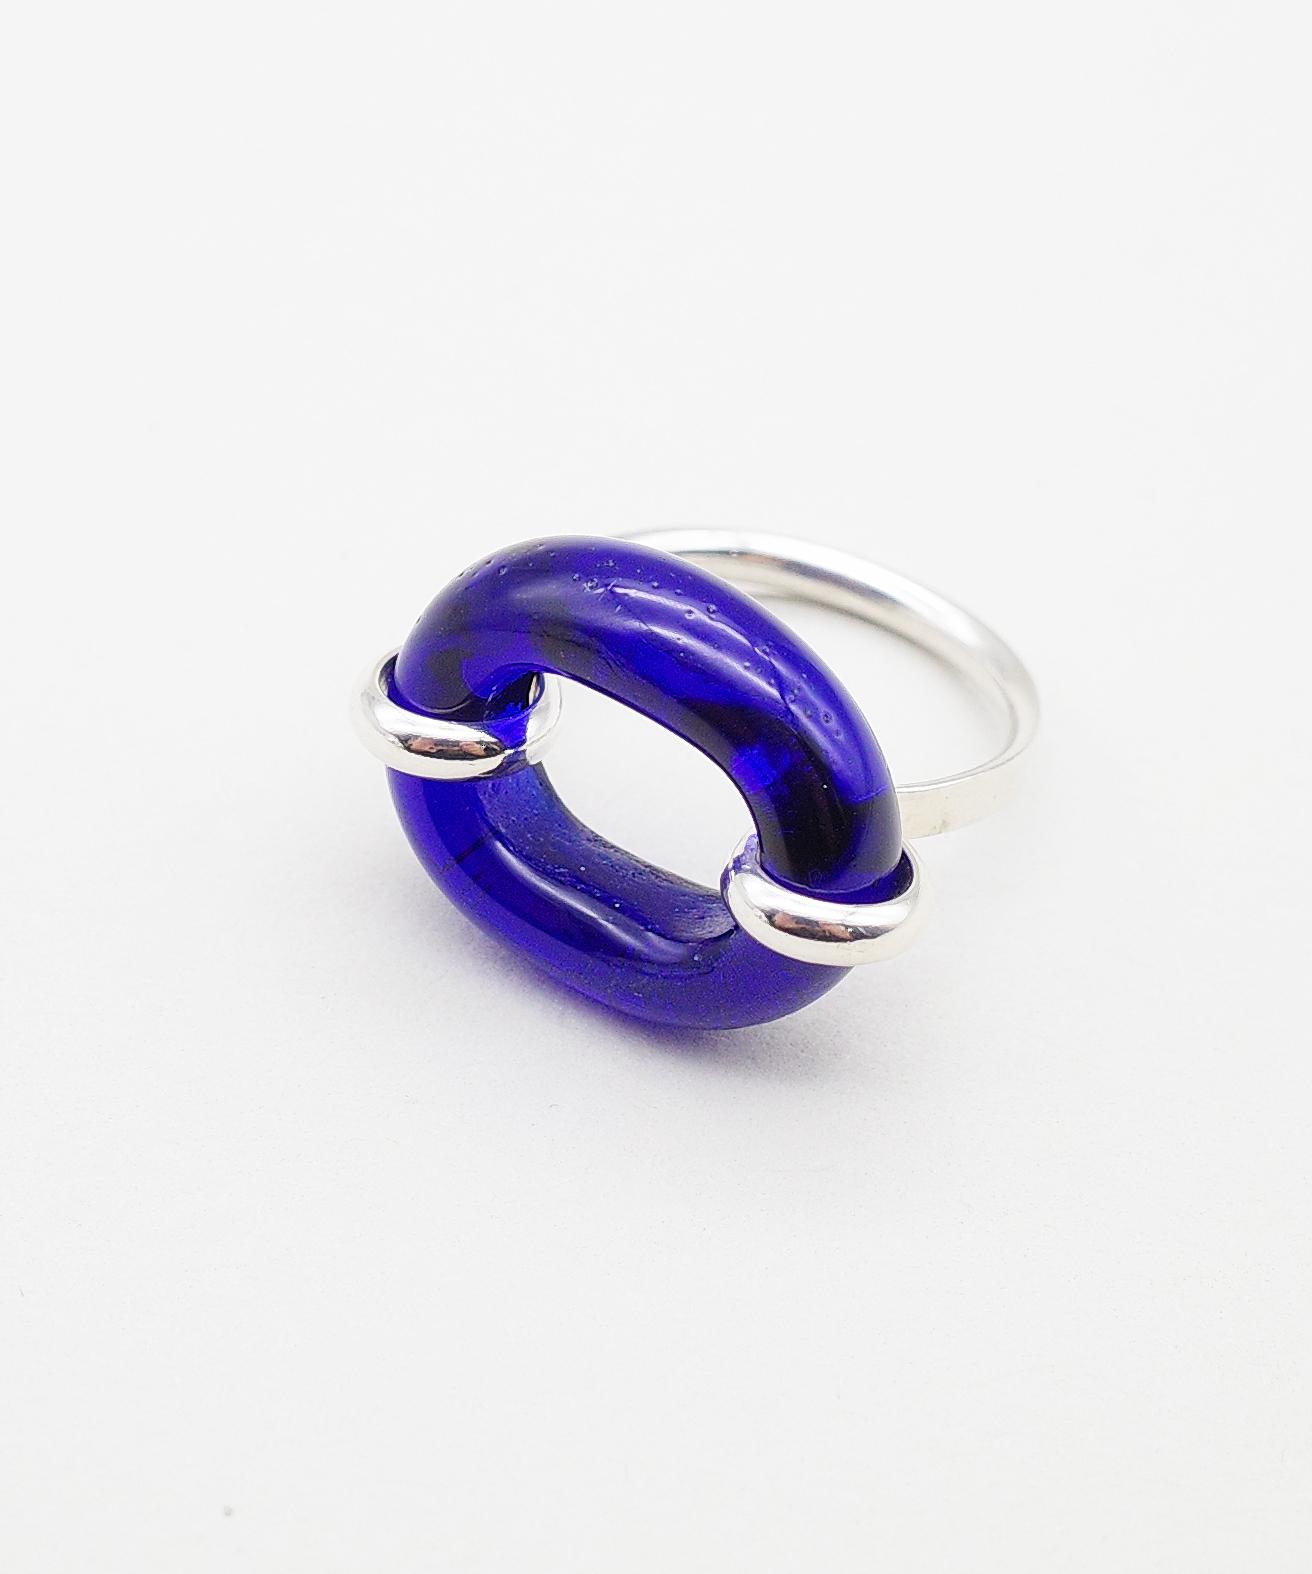 【CLED / クレッド】IN THE LOOP Ring / リング / Sterling silver×Blue Ocean